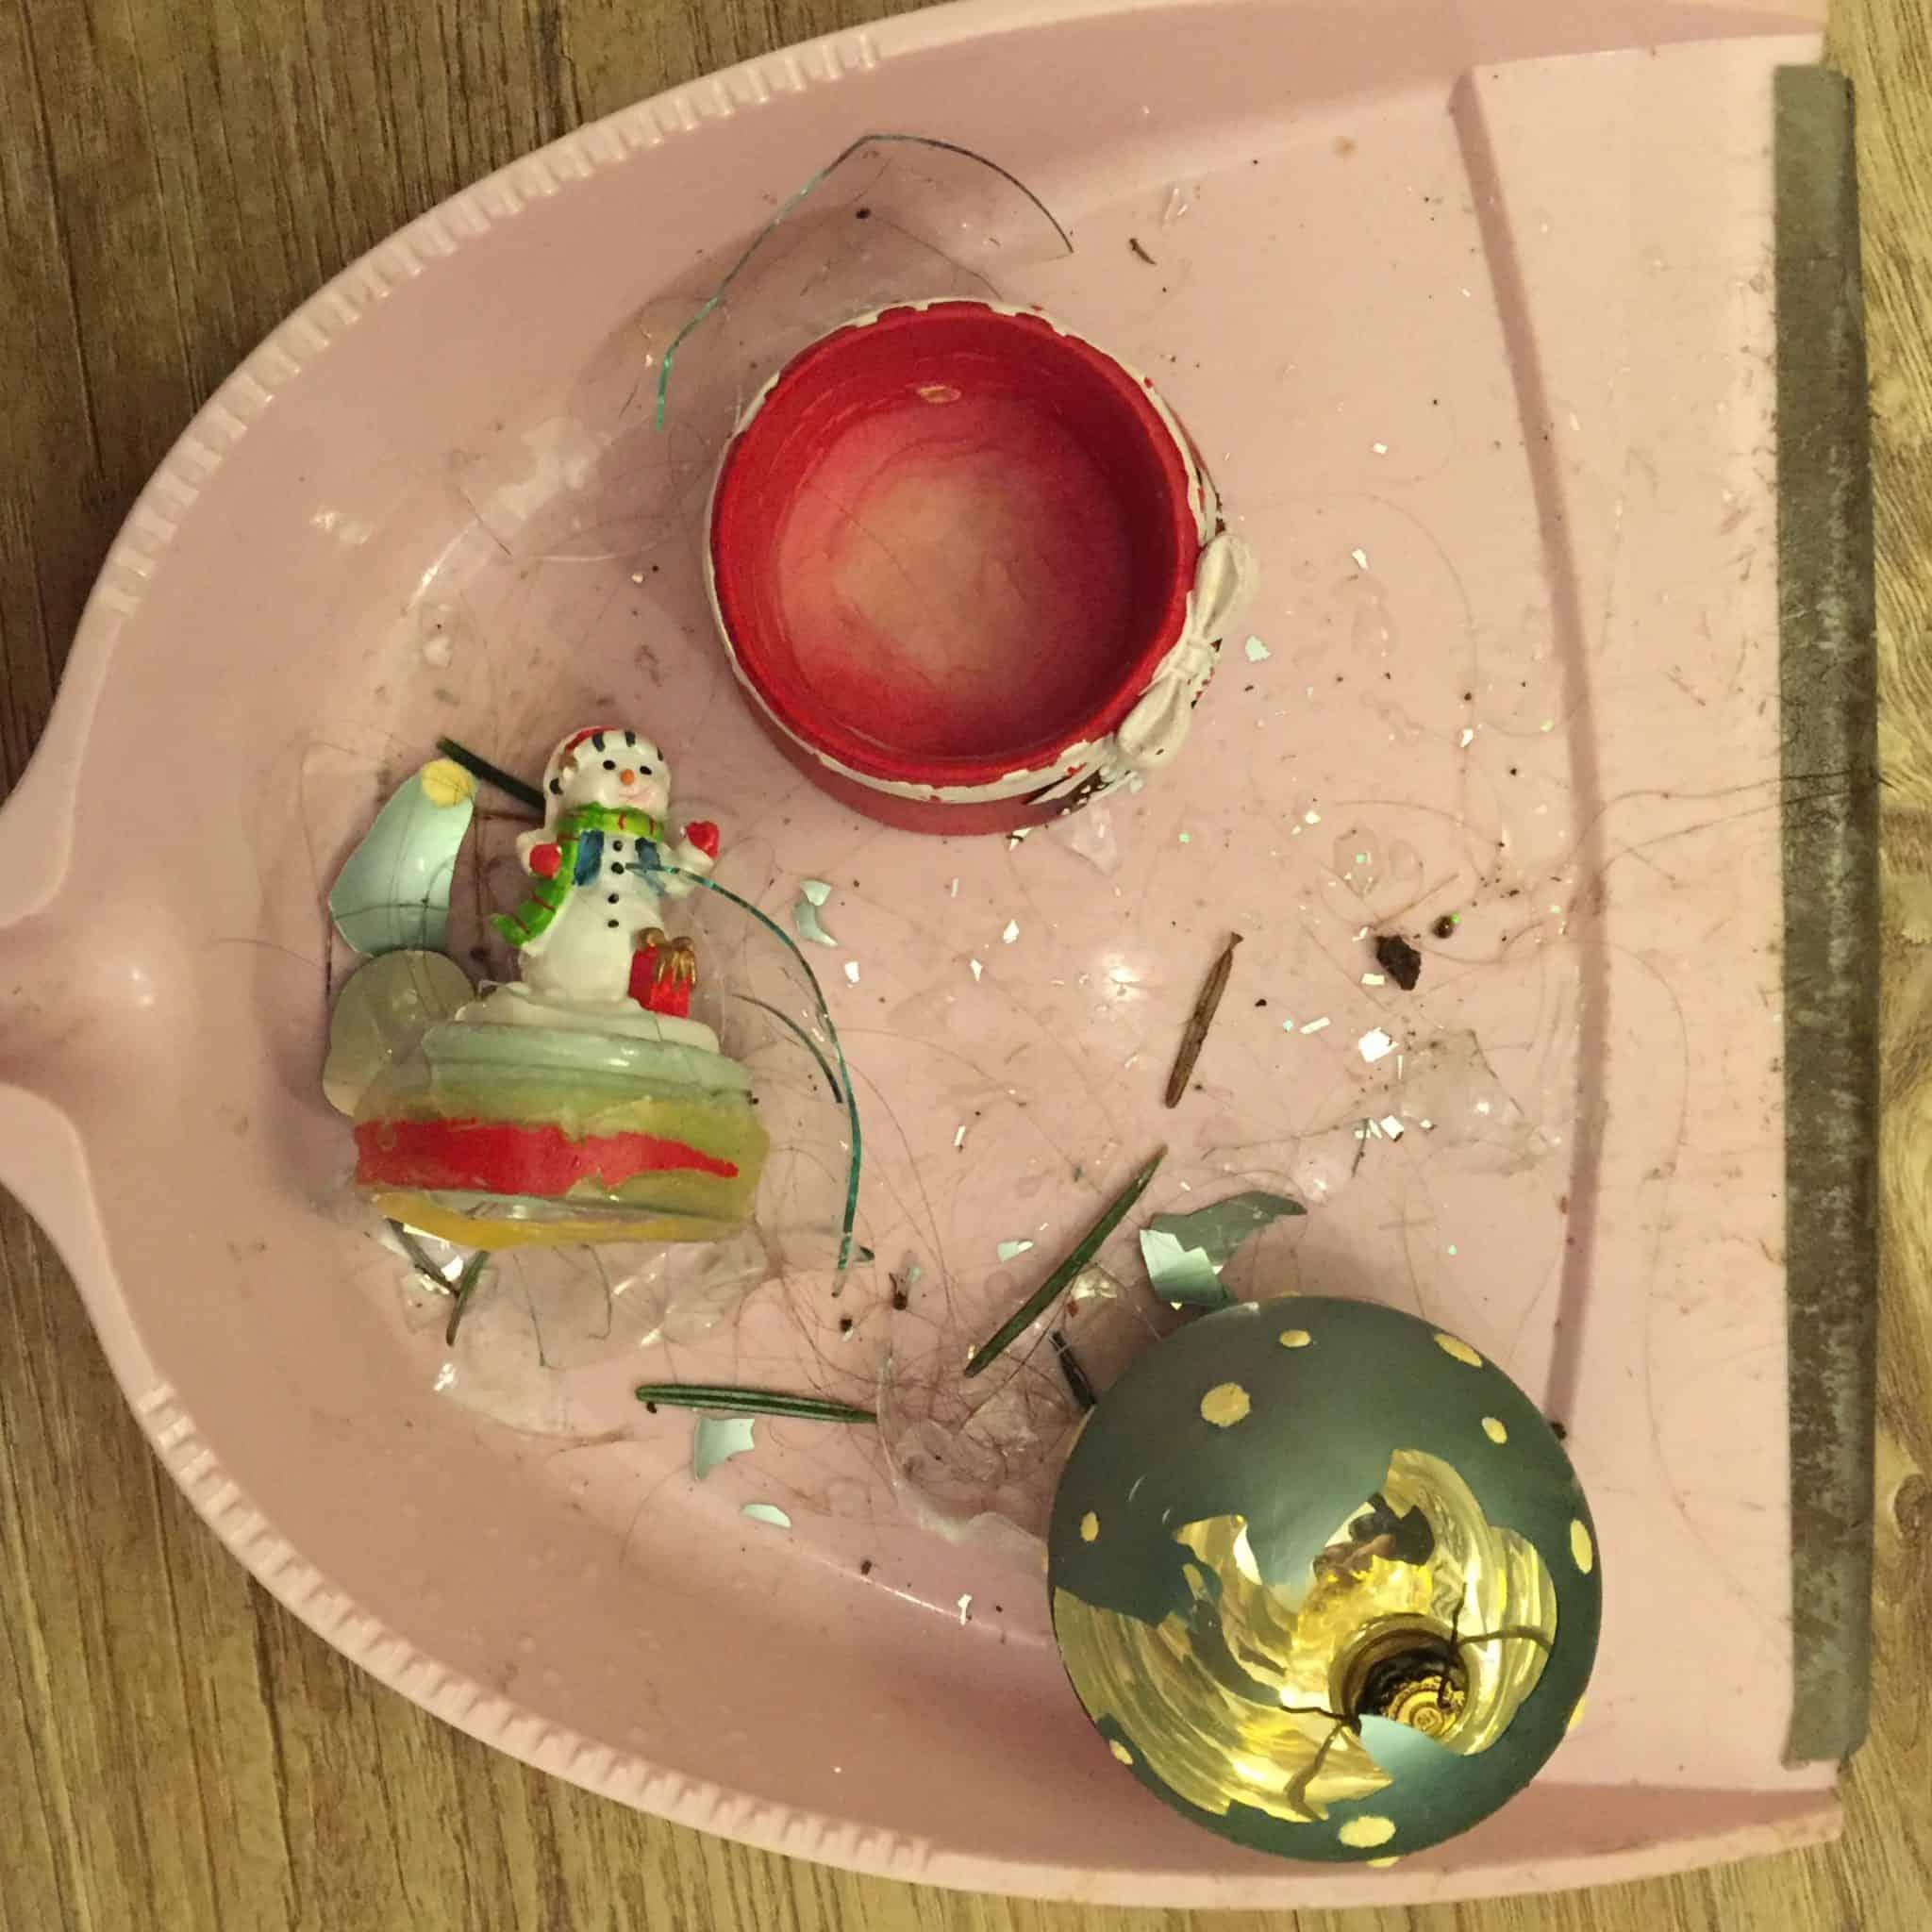 Broken bauble and snow globe